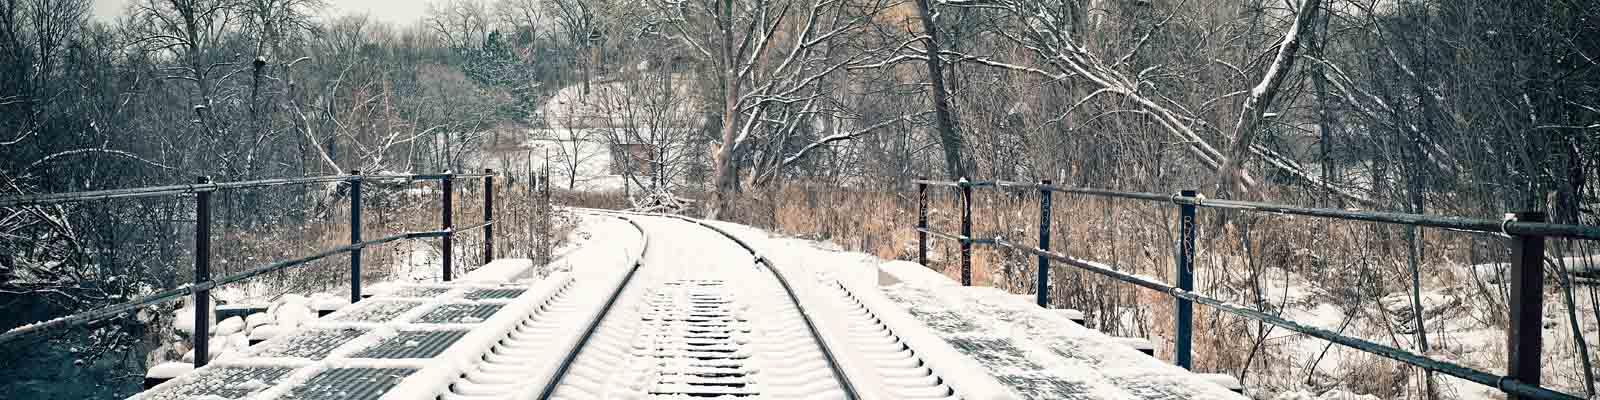 Pictured: Railroad tracks in Minnesota.